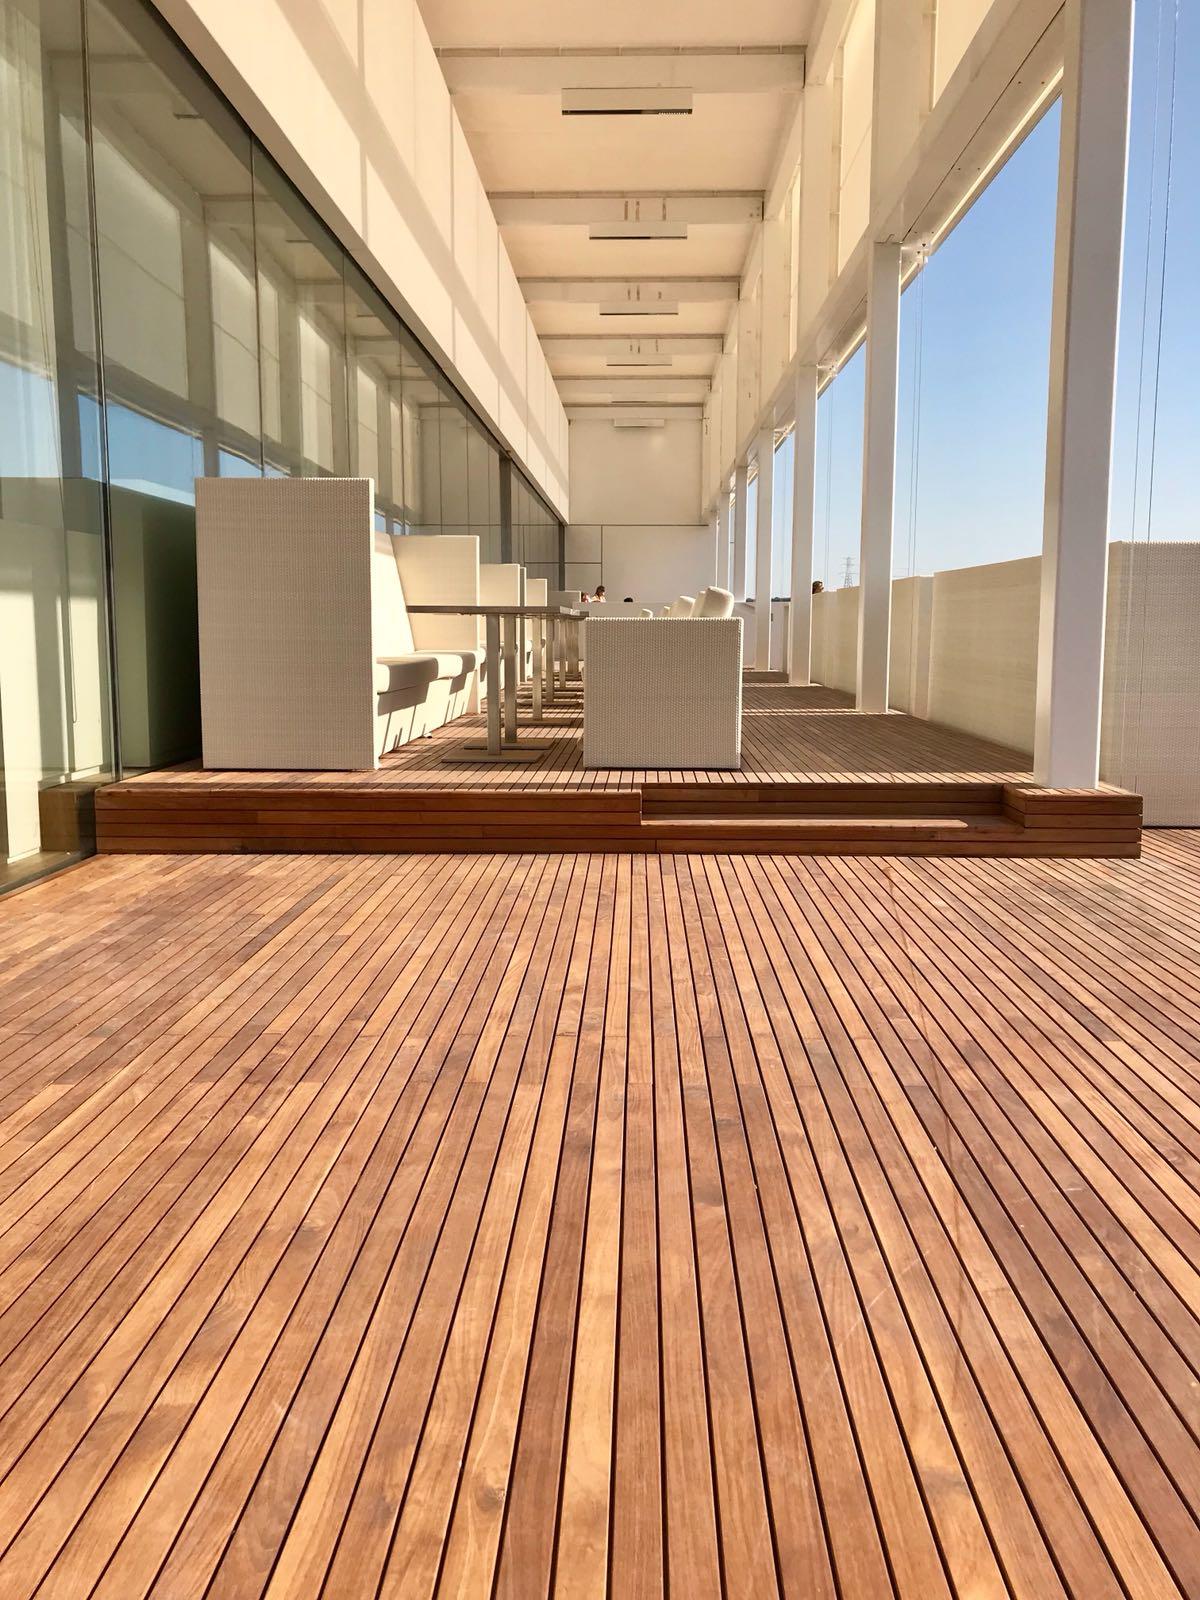 Composite Decks available from Siwek Lumber Jordan